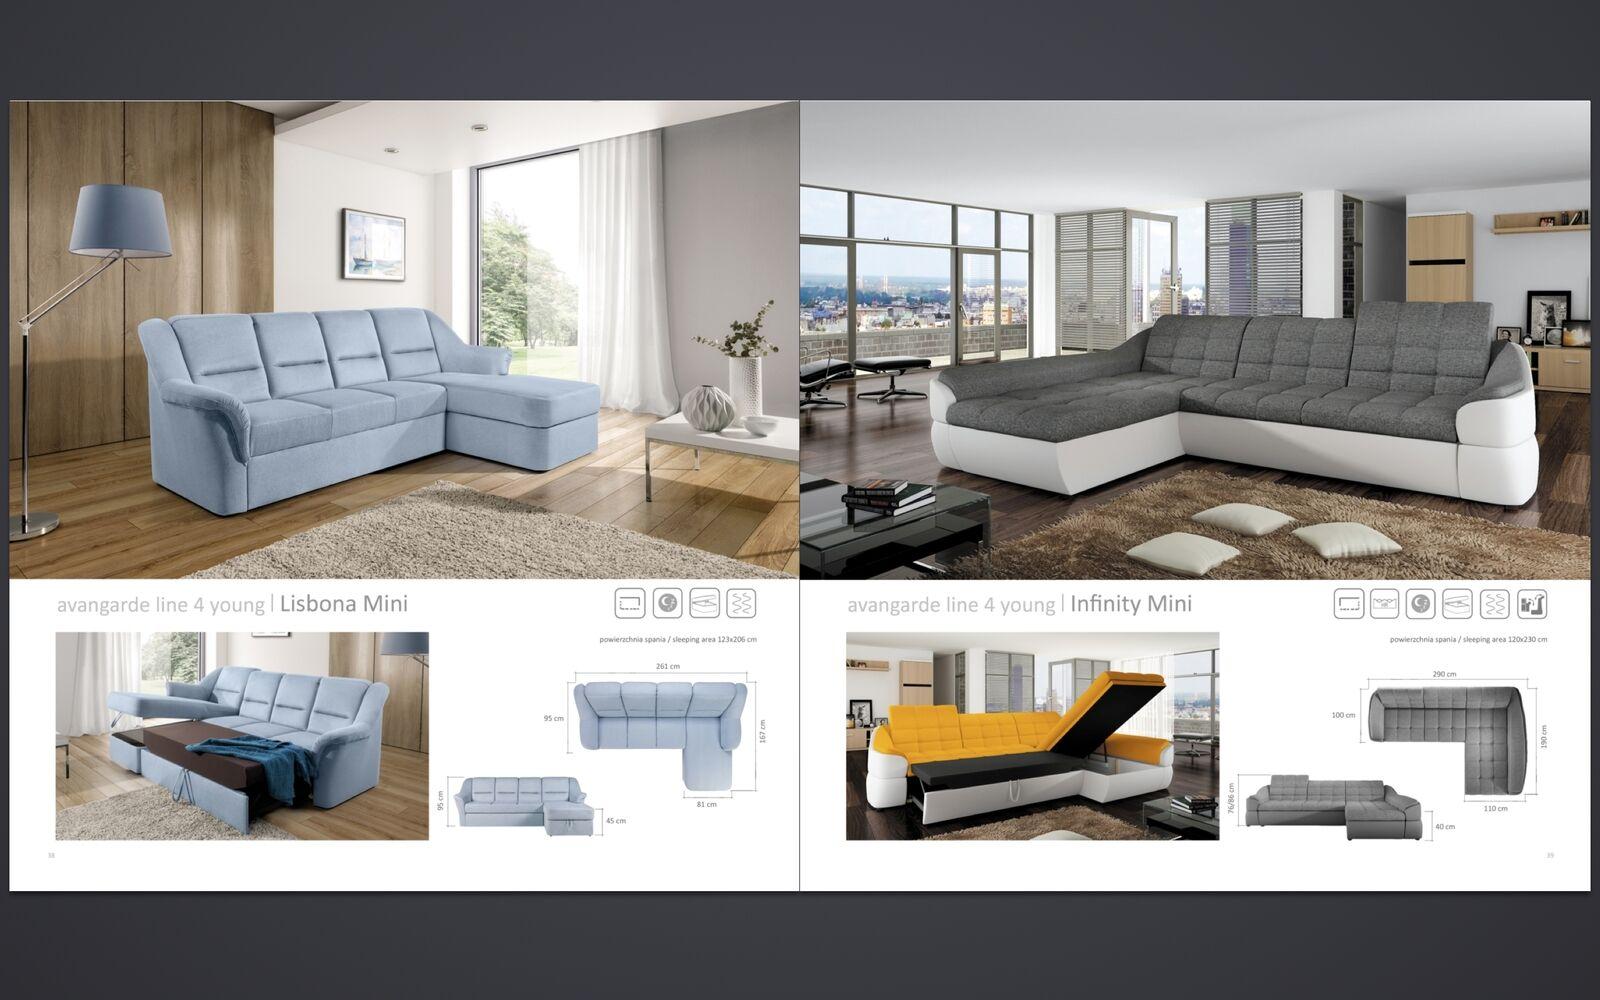 couchgarnitur infinity mini sofa mit schlaffunktion couch. Black Bedroom Furniture Sets. Home Design Ideas